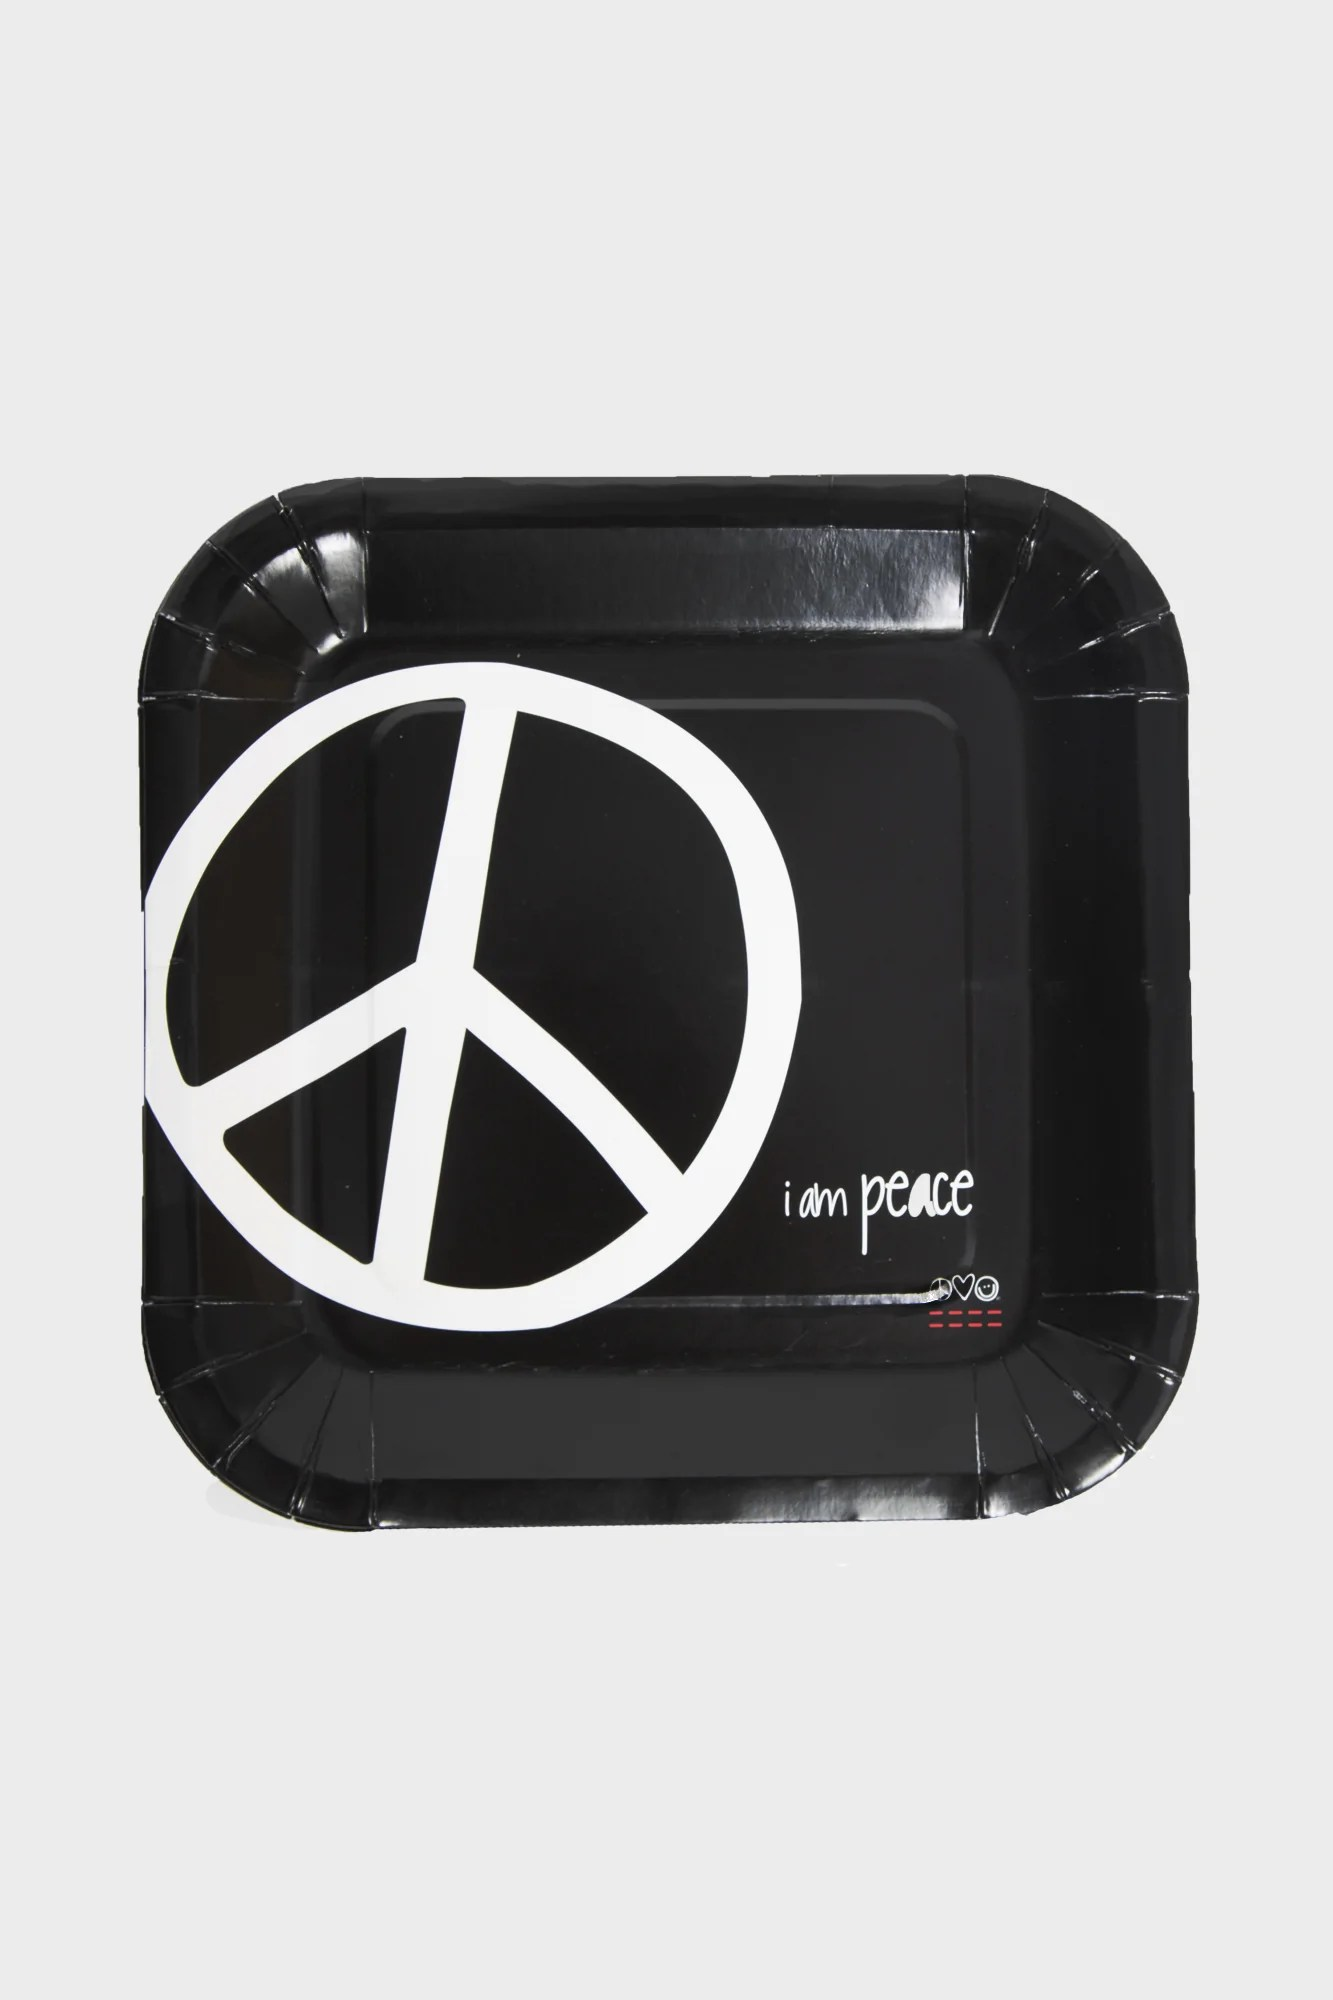 i am peace plates